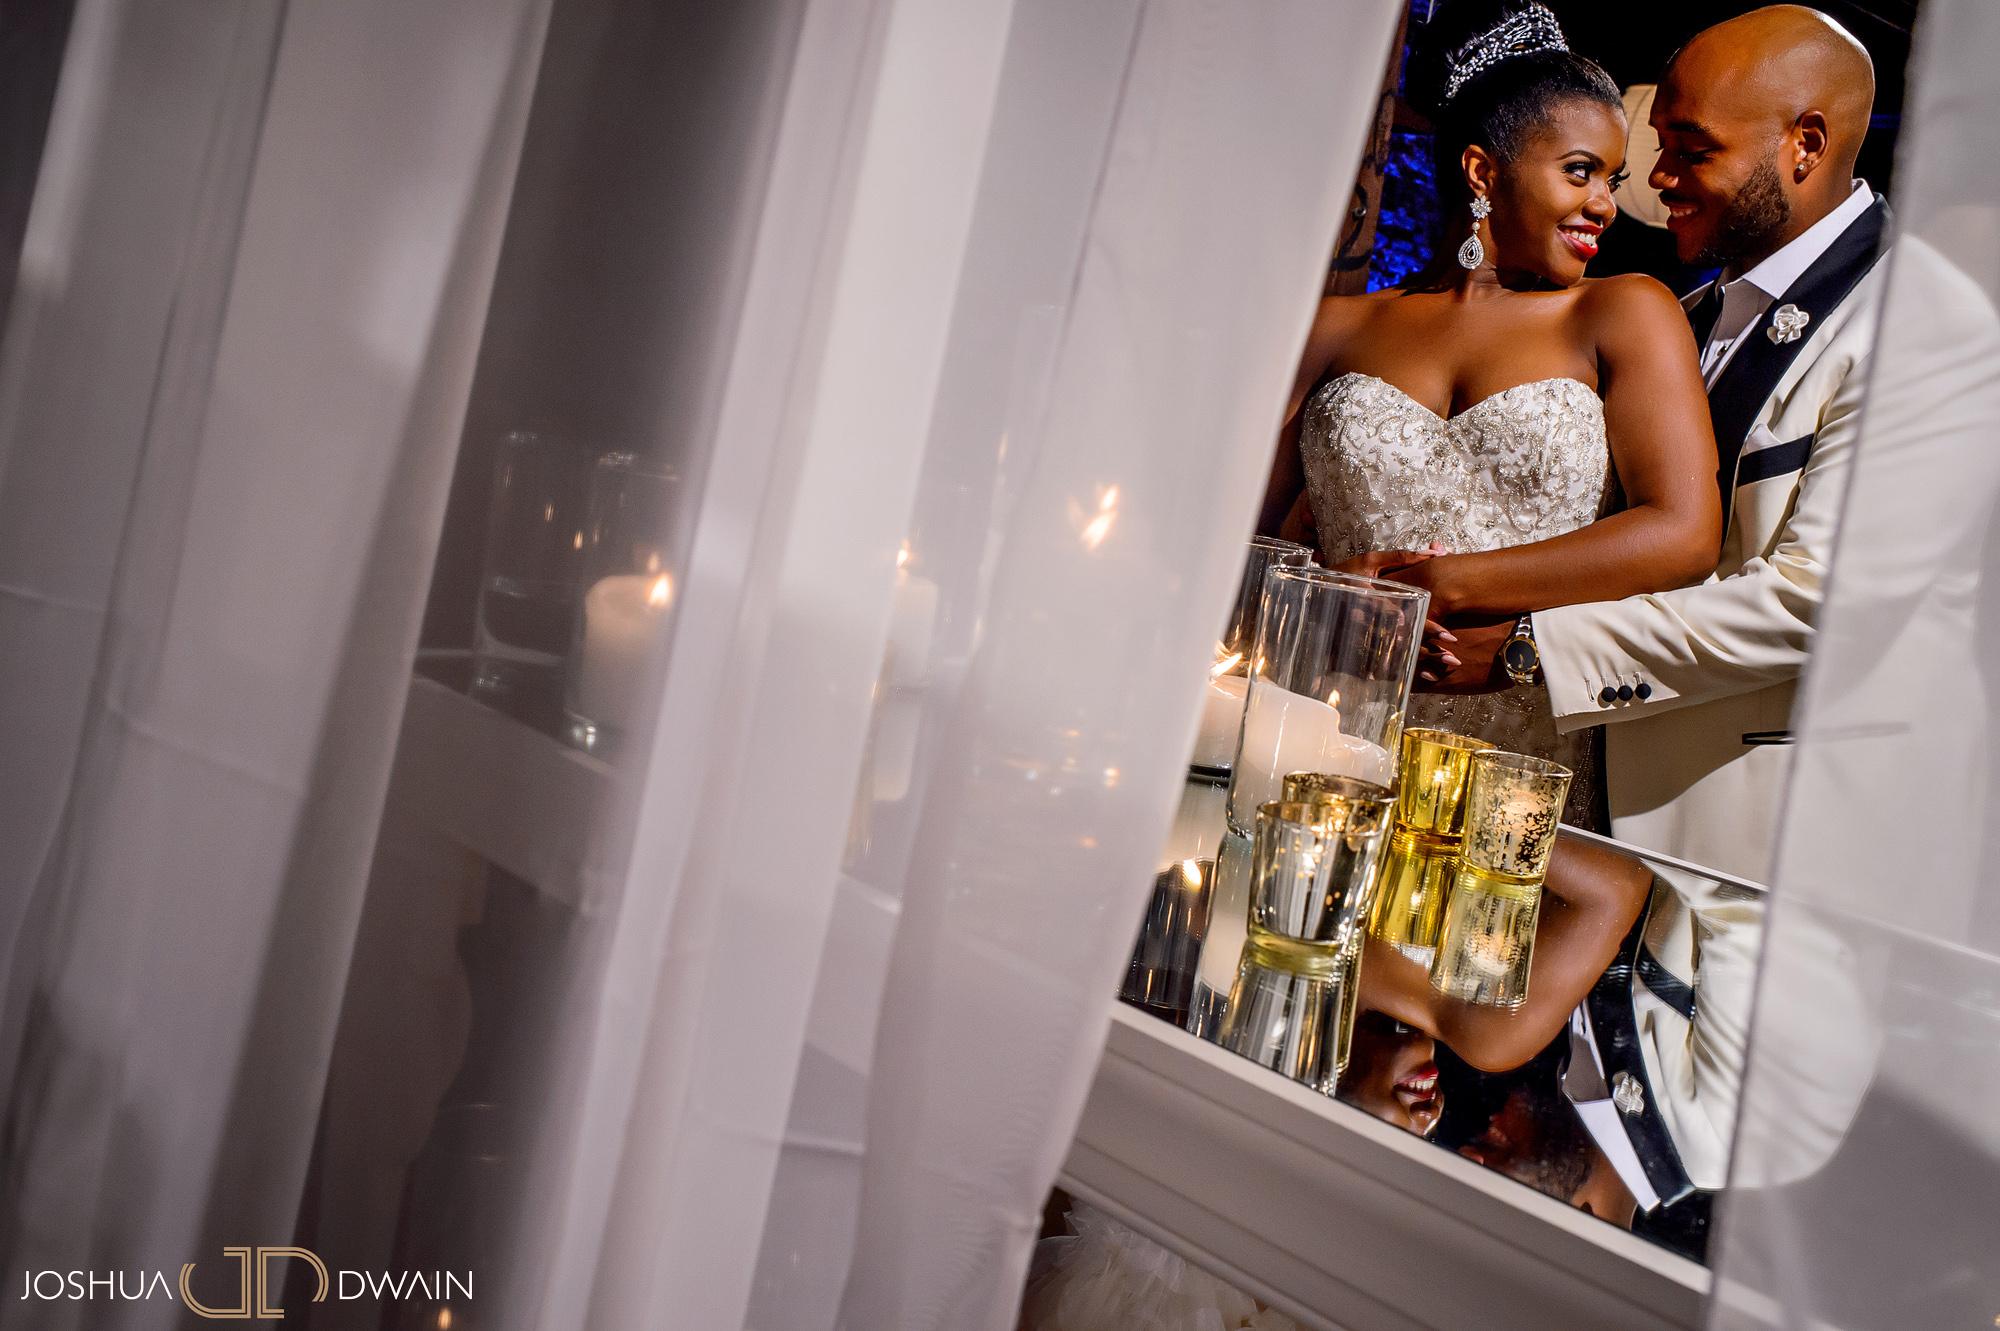 joshua-dwain-weddings-gallery-best-wedding-photographers-us-042